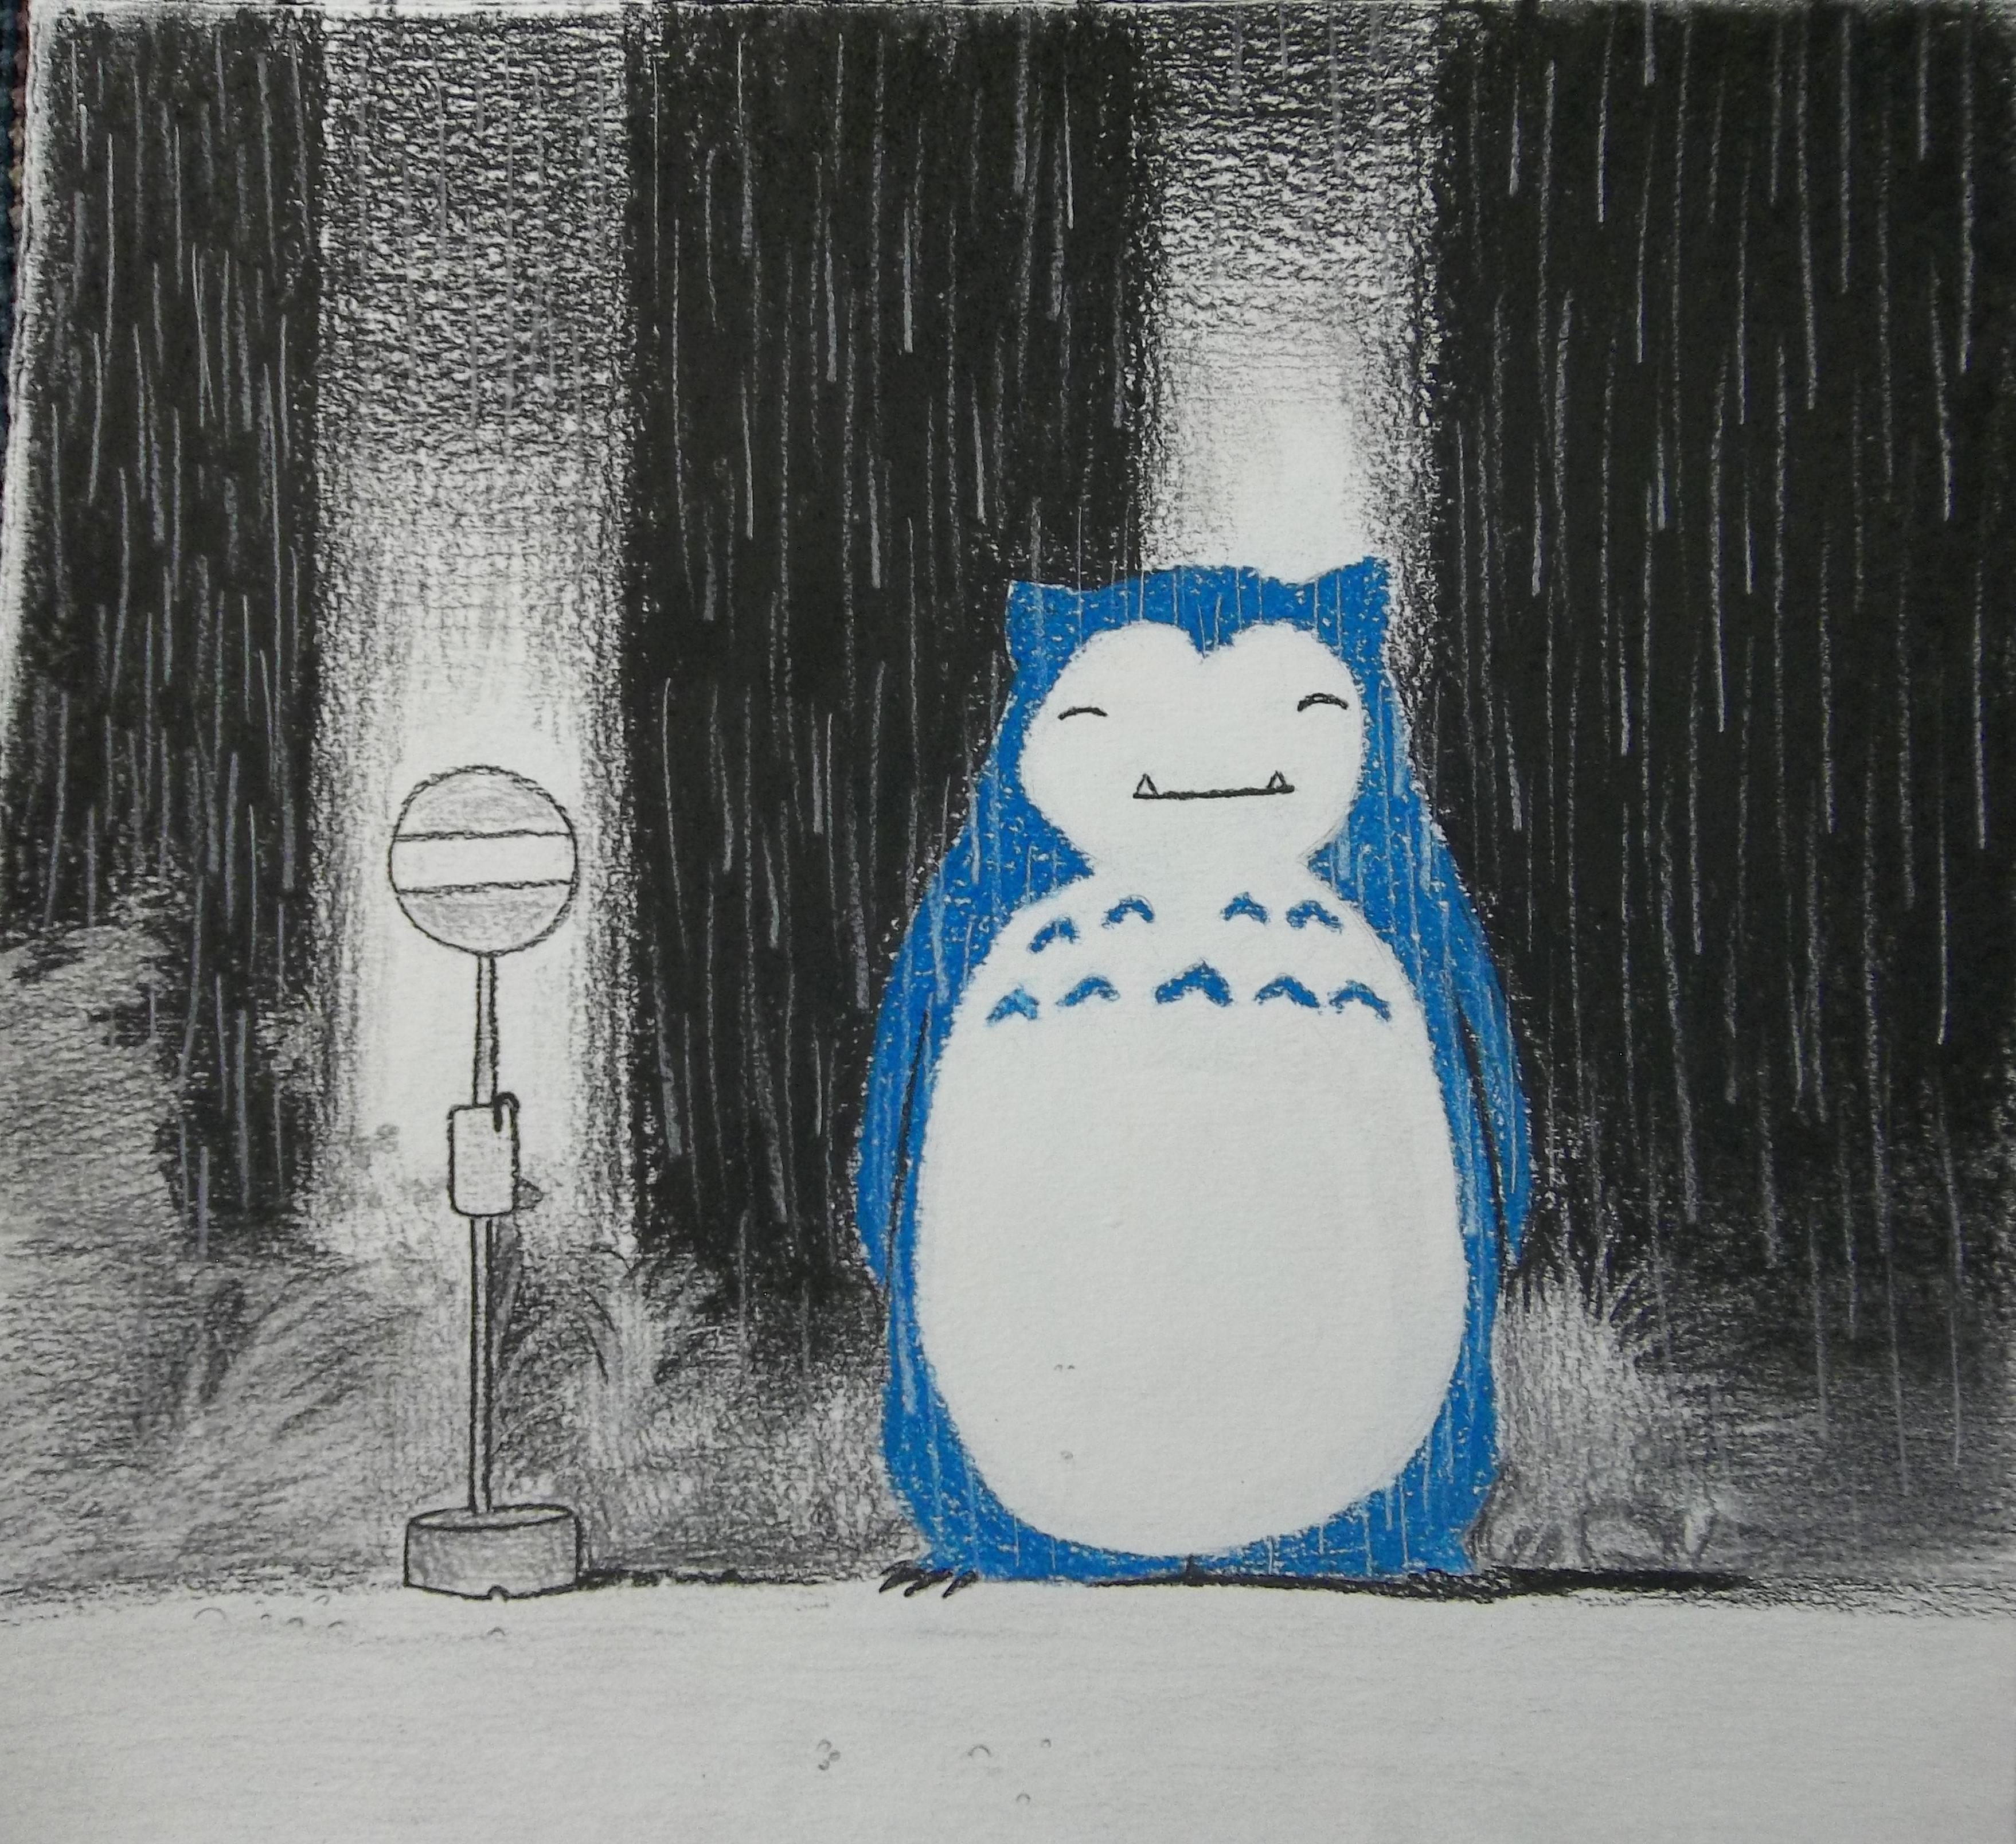 Snorlax/Totoro